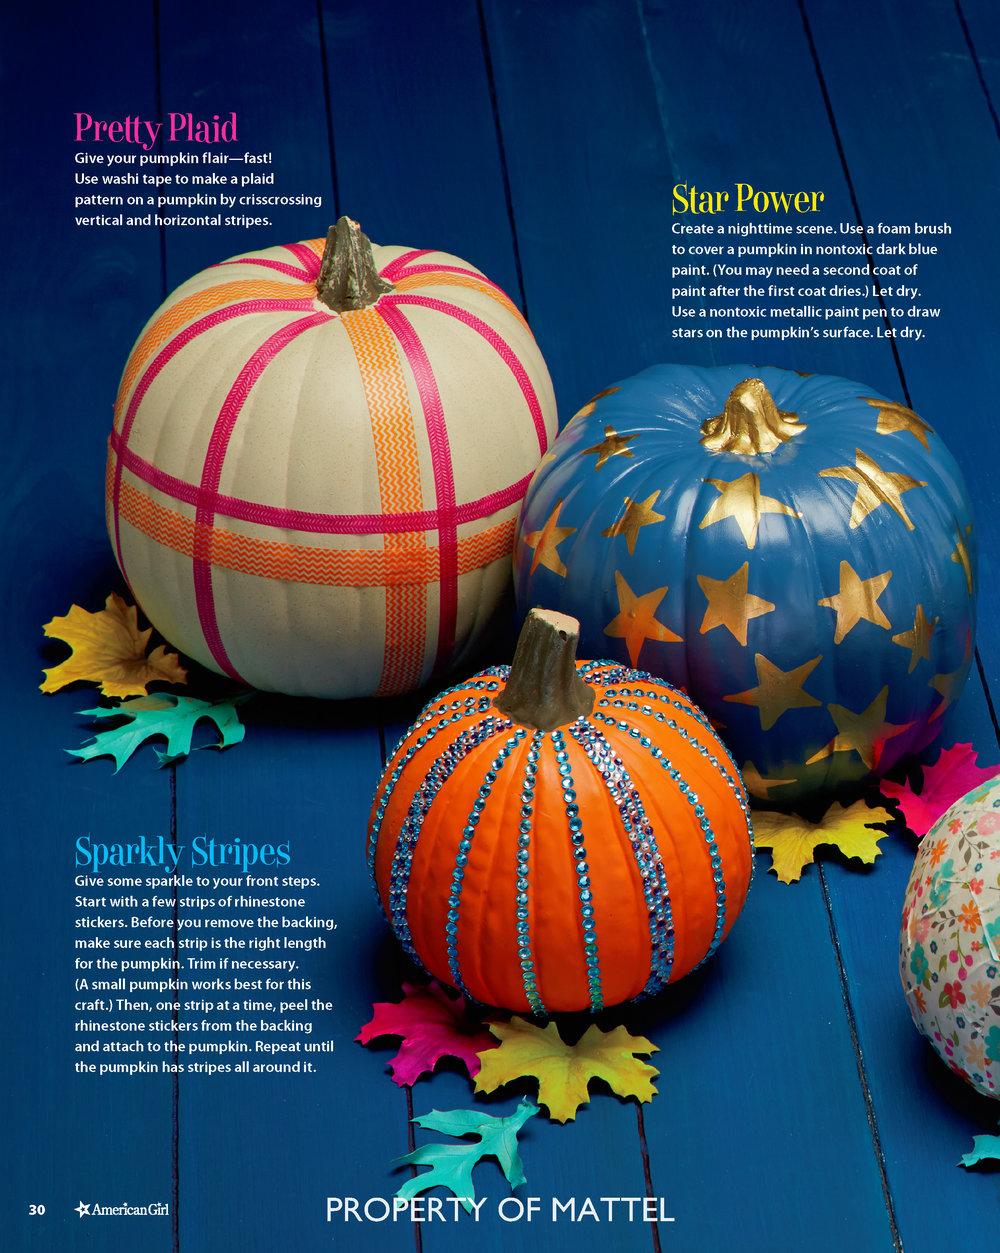 GreatPumpkinsFeature_Page_3.jpg